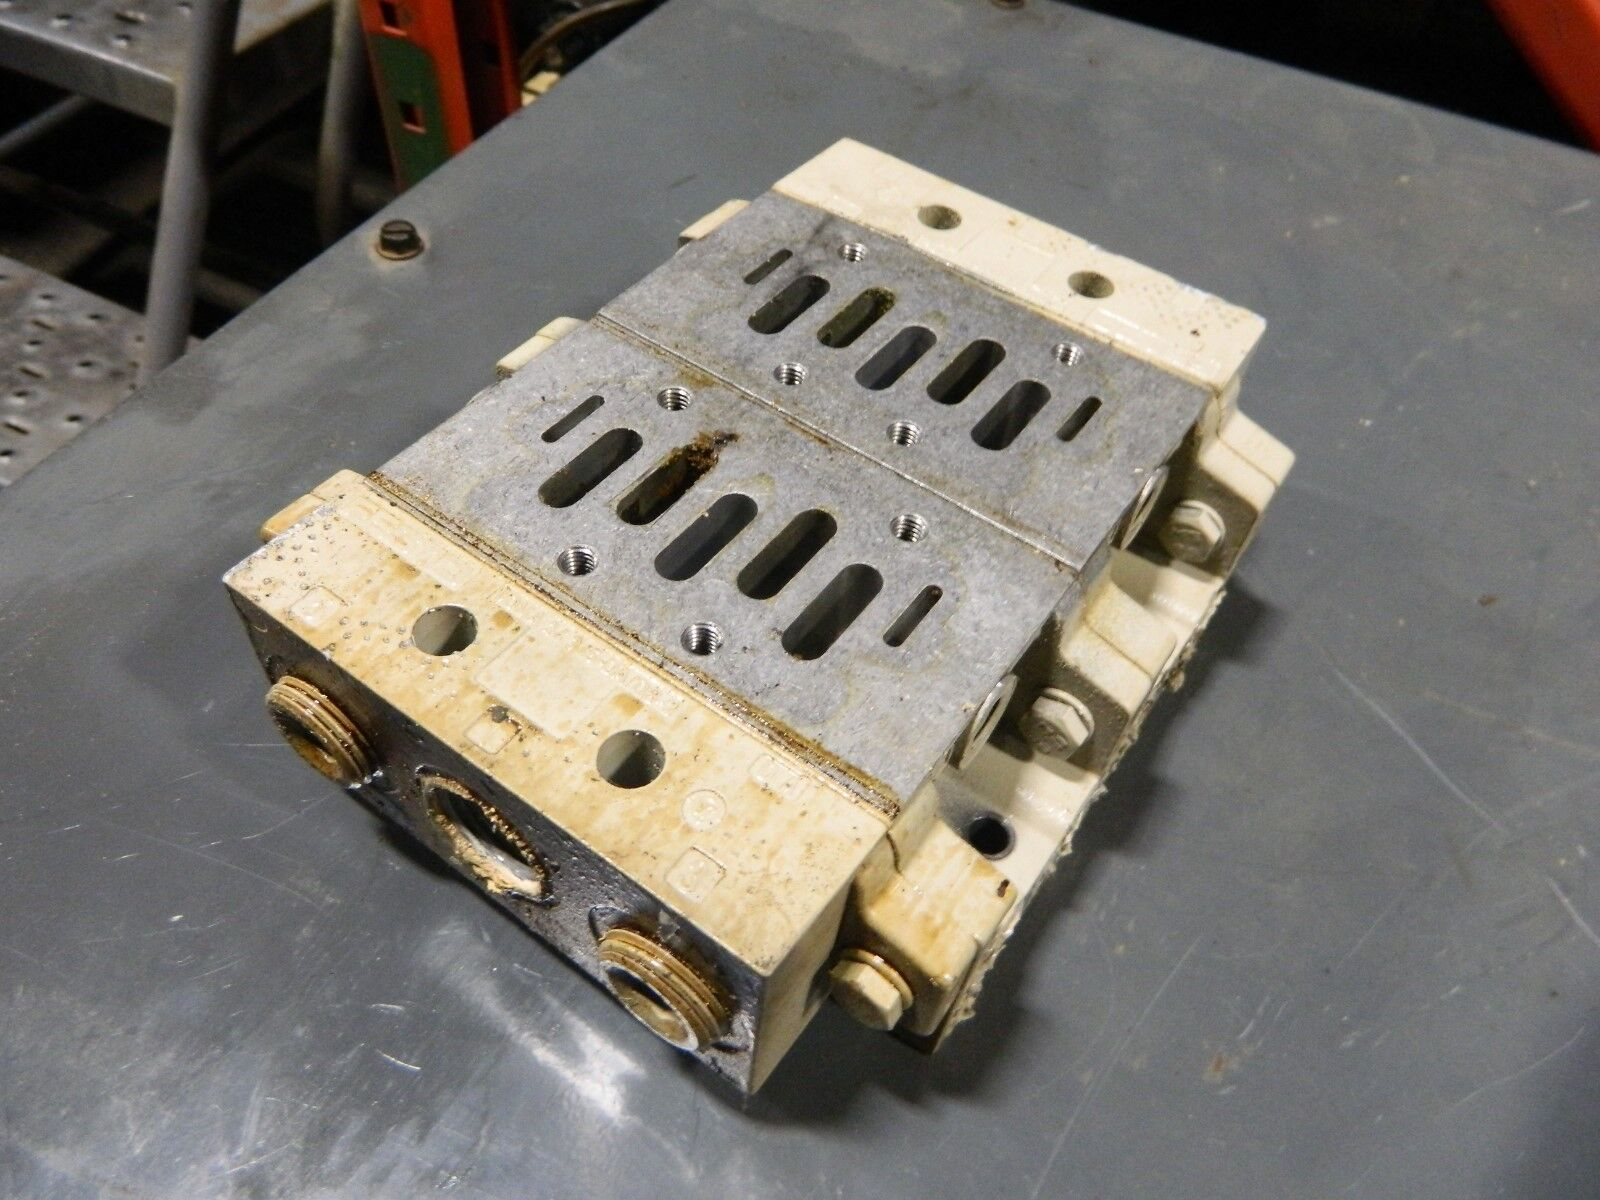 Festo Aluminum Manifold Body, 2-VDMA 24 345- DA/DB-2 & 2 - NAVW-3/8-2-NPT, Used